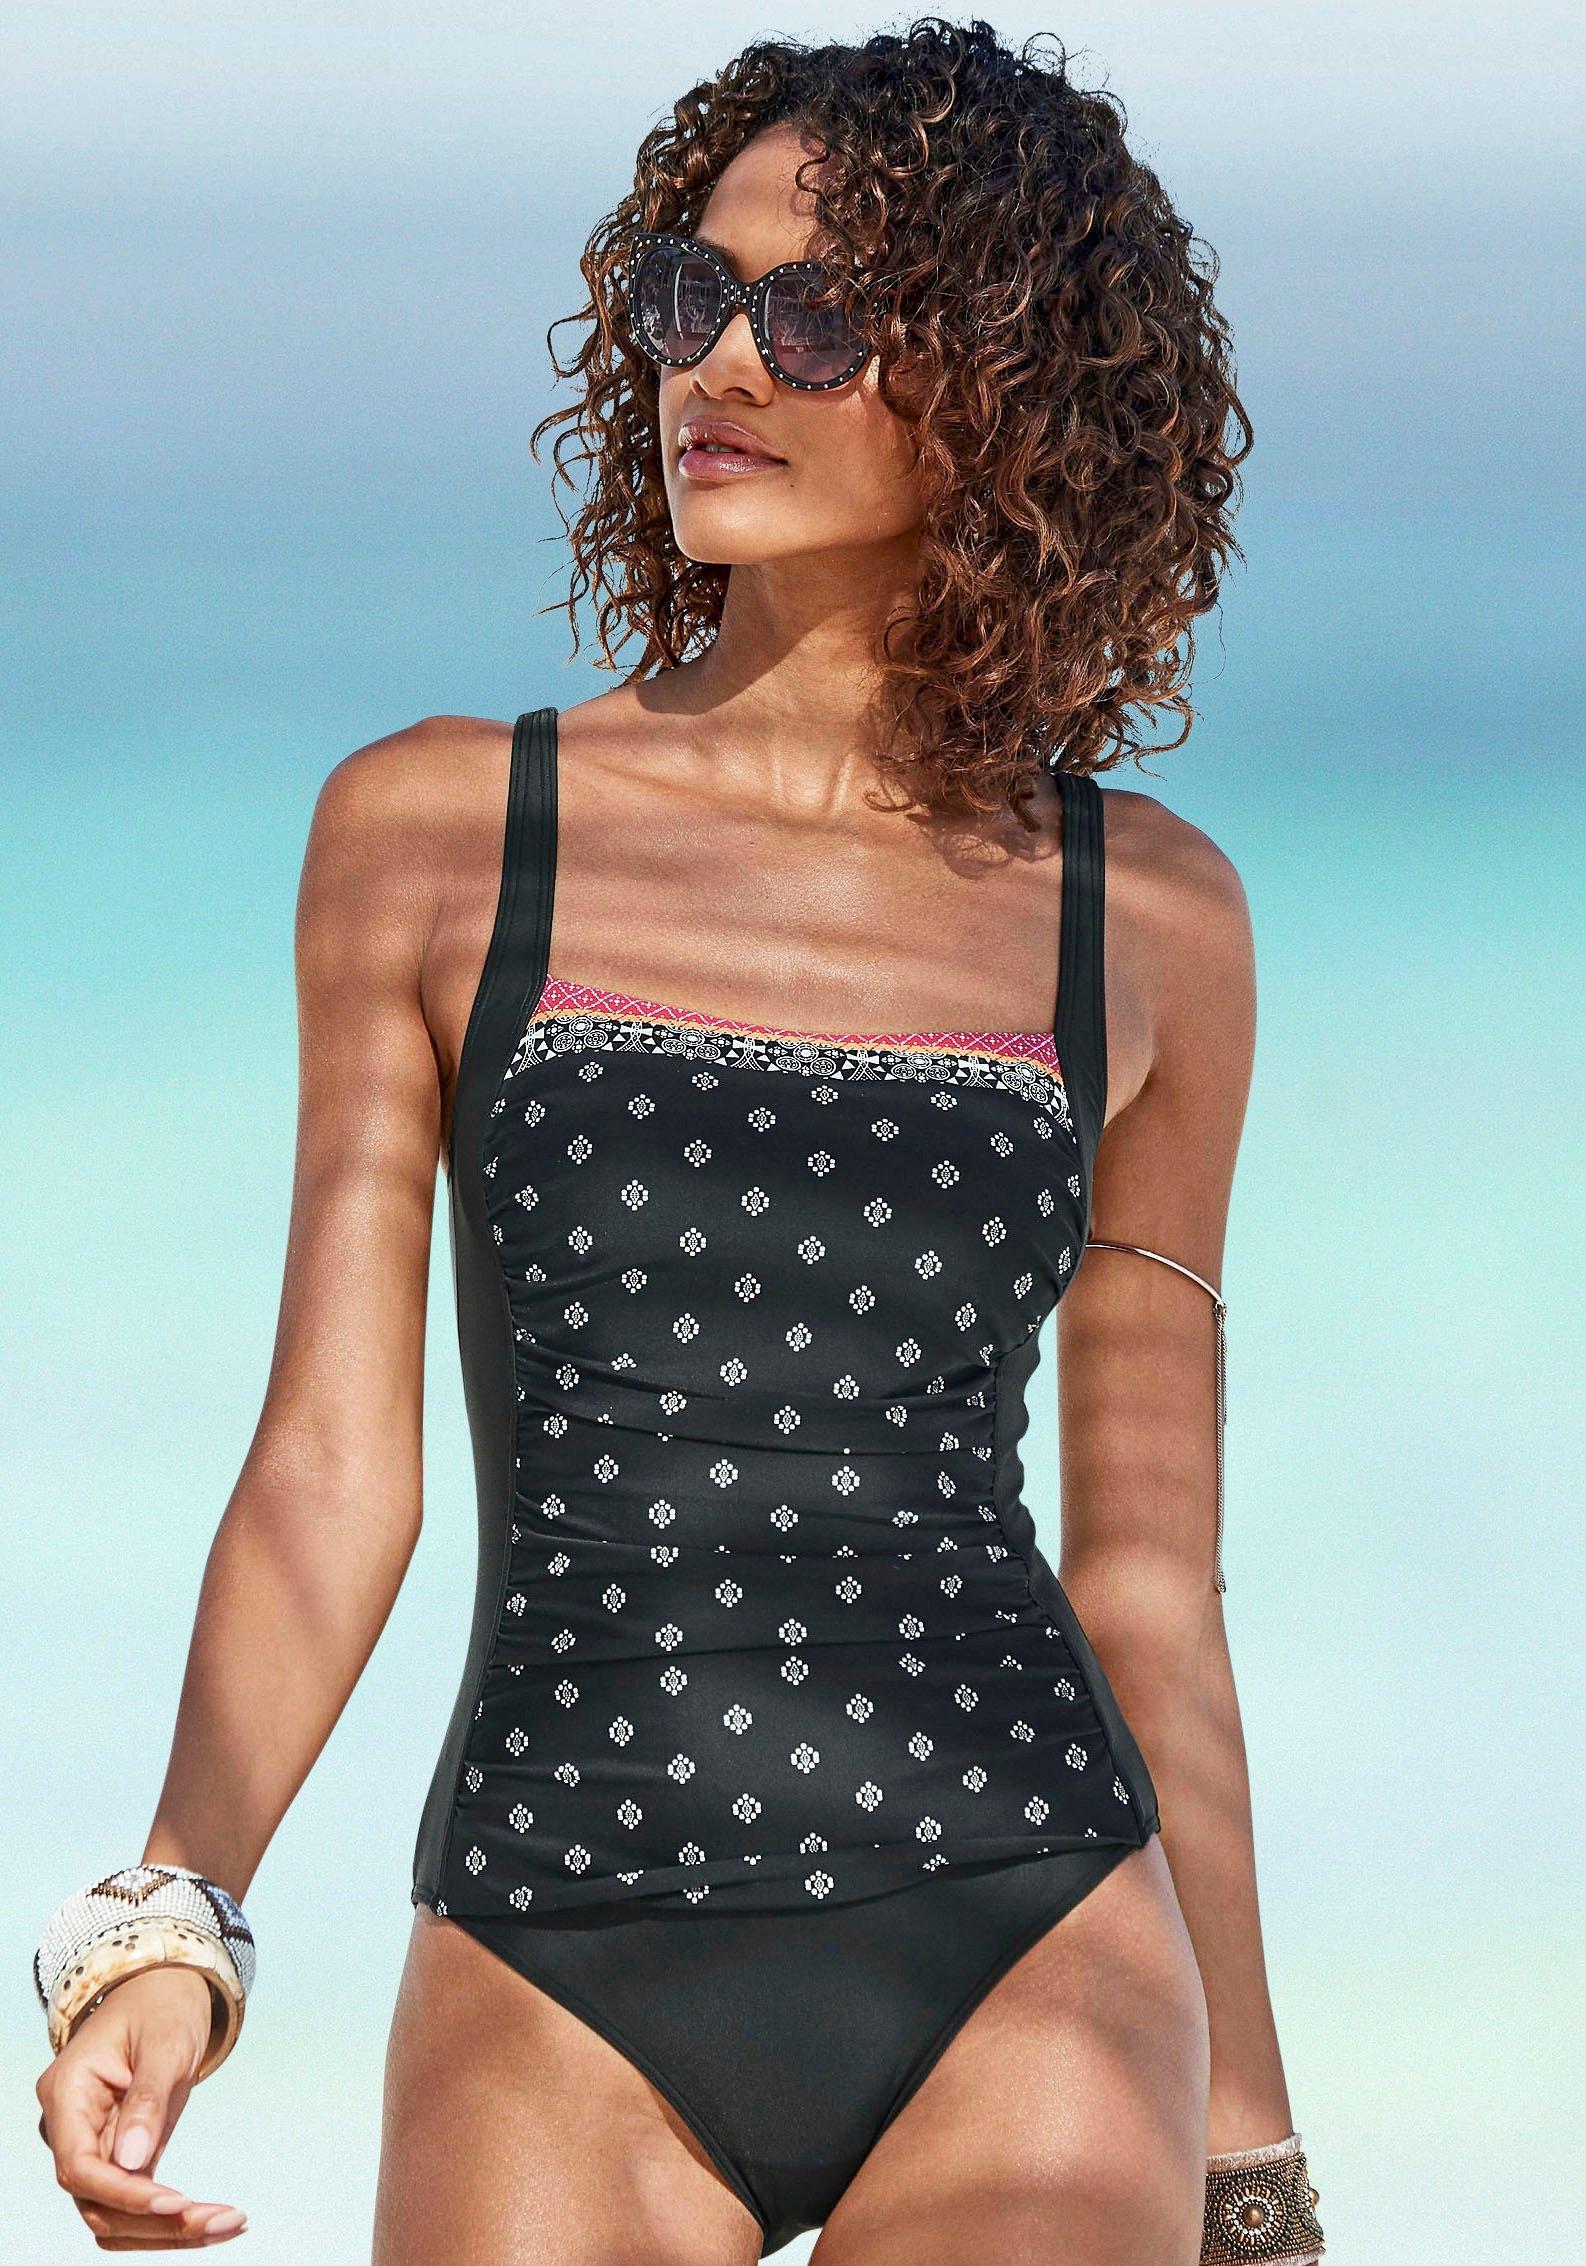 Lascana badpak Kimer met moderne print en modellerend effect voordelig en veilig online kopen